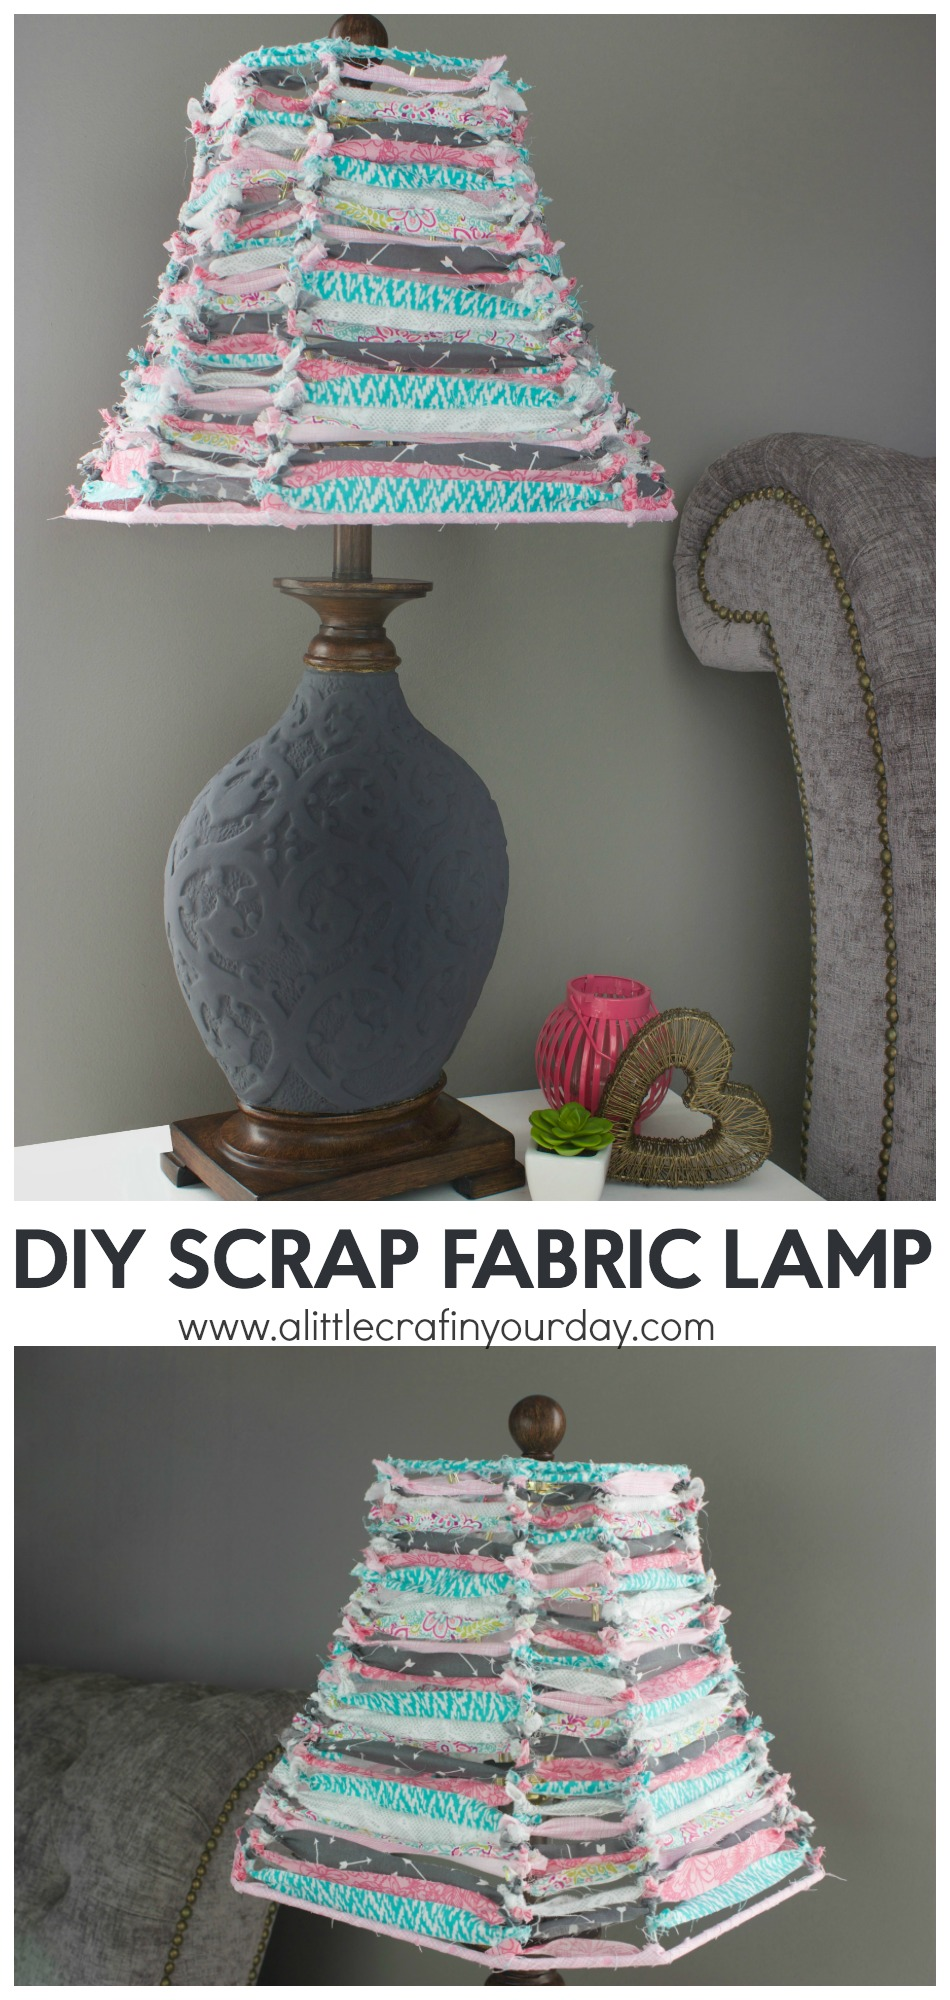 DIY_Scrap_fabric_lamp_1